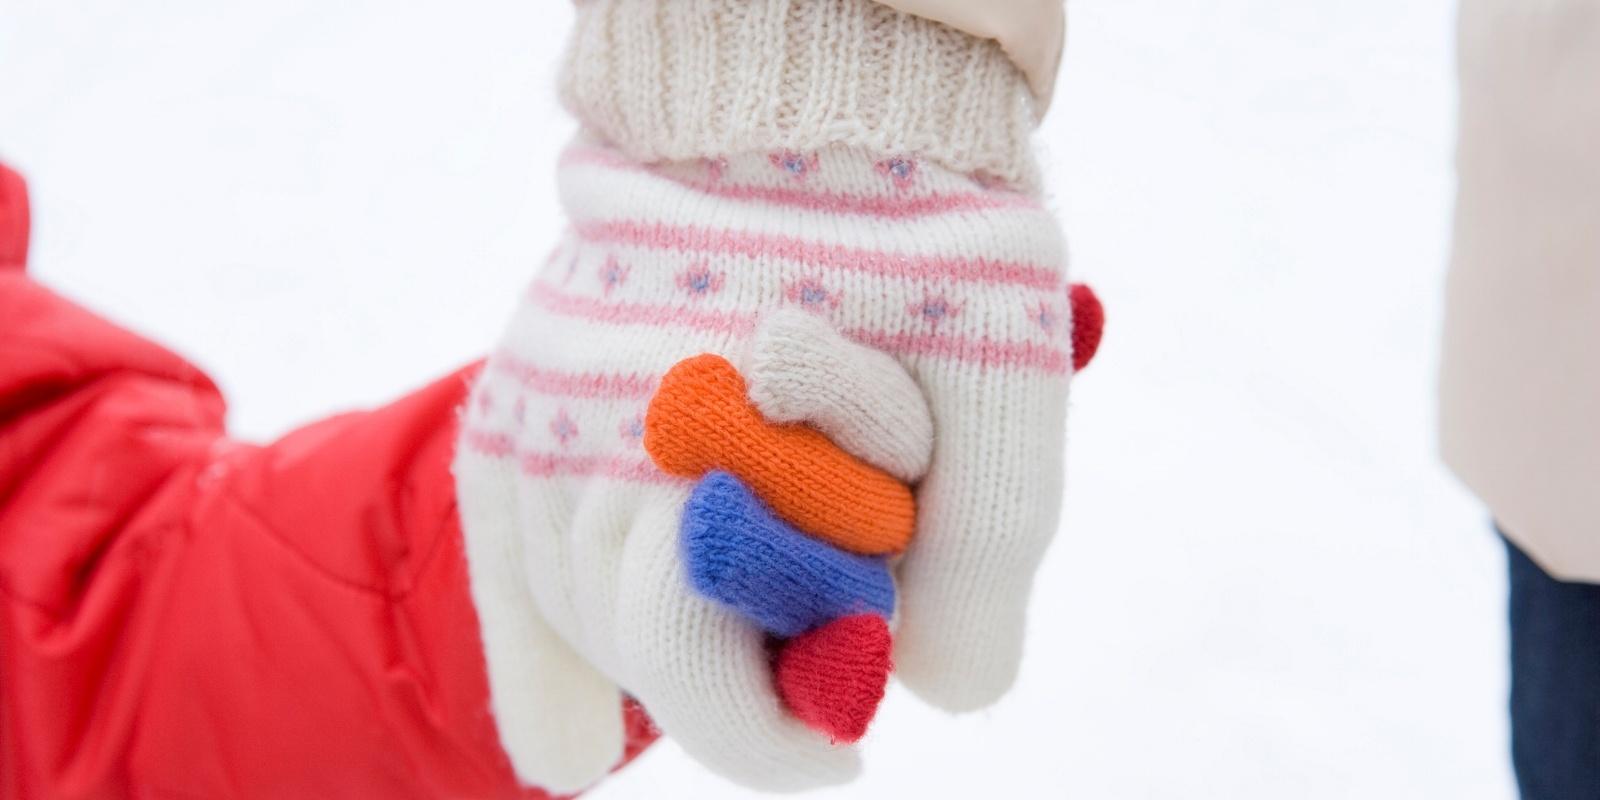 hat-glove-donation-minneapolis.jpg